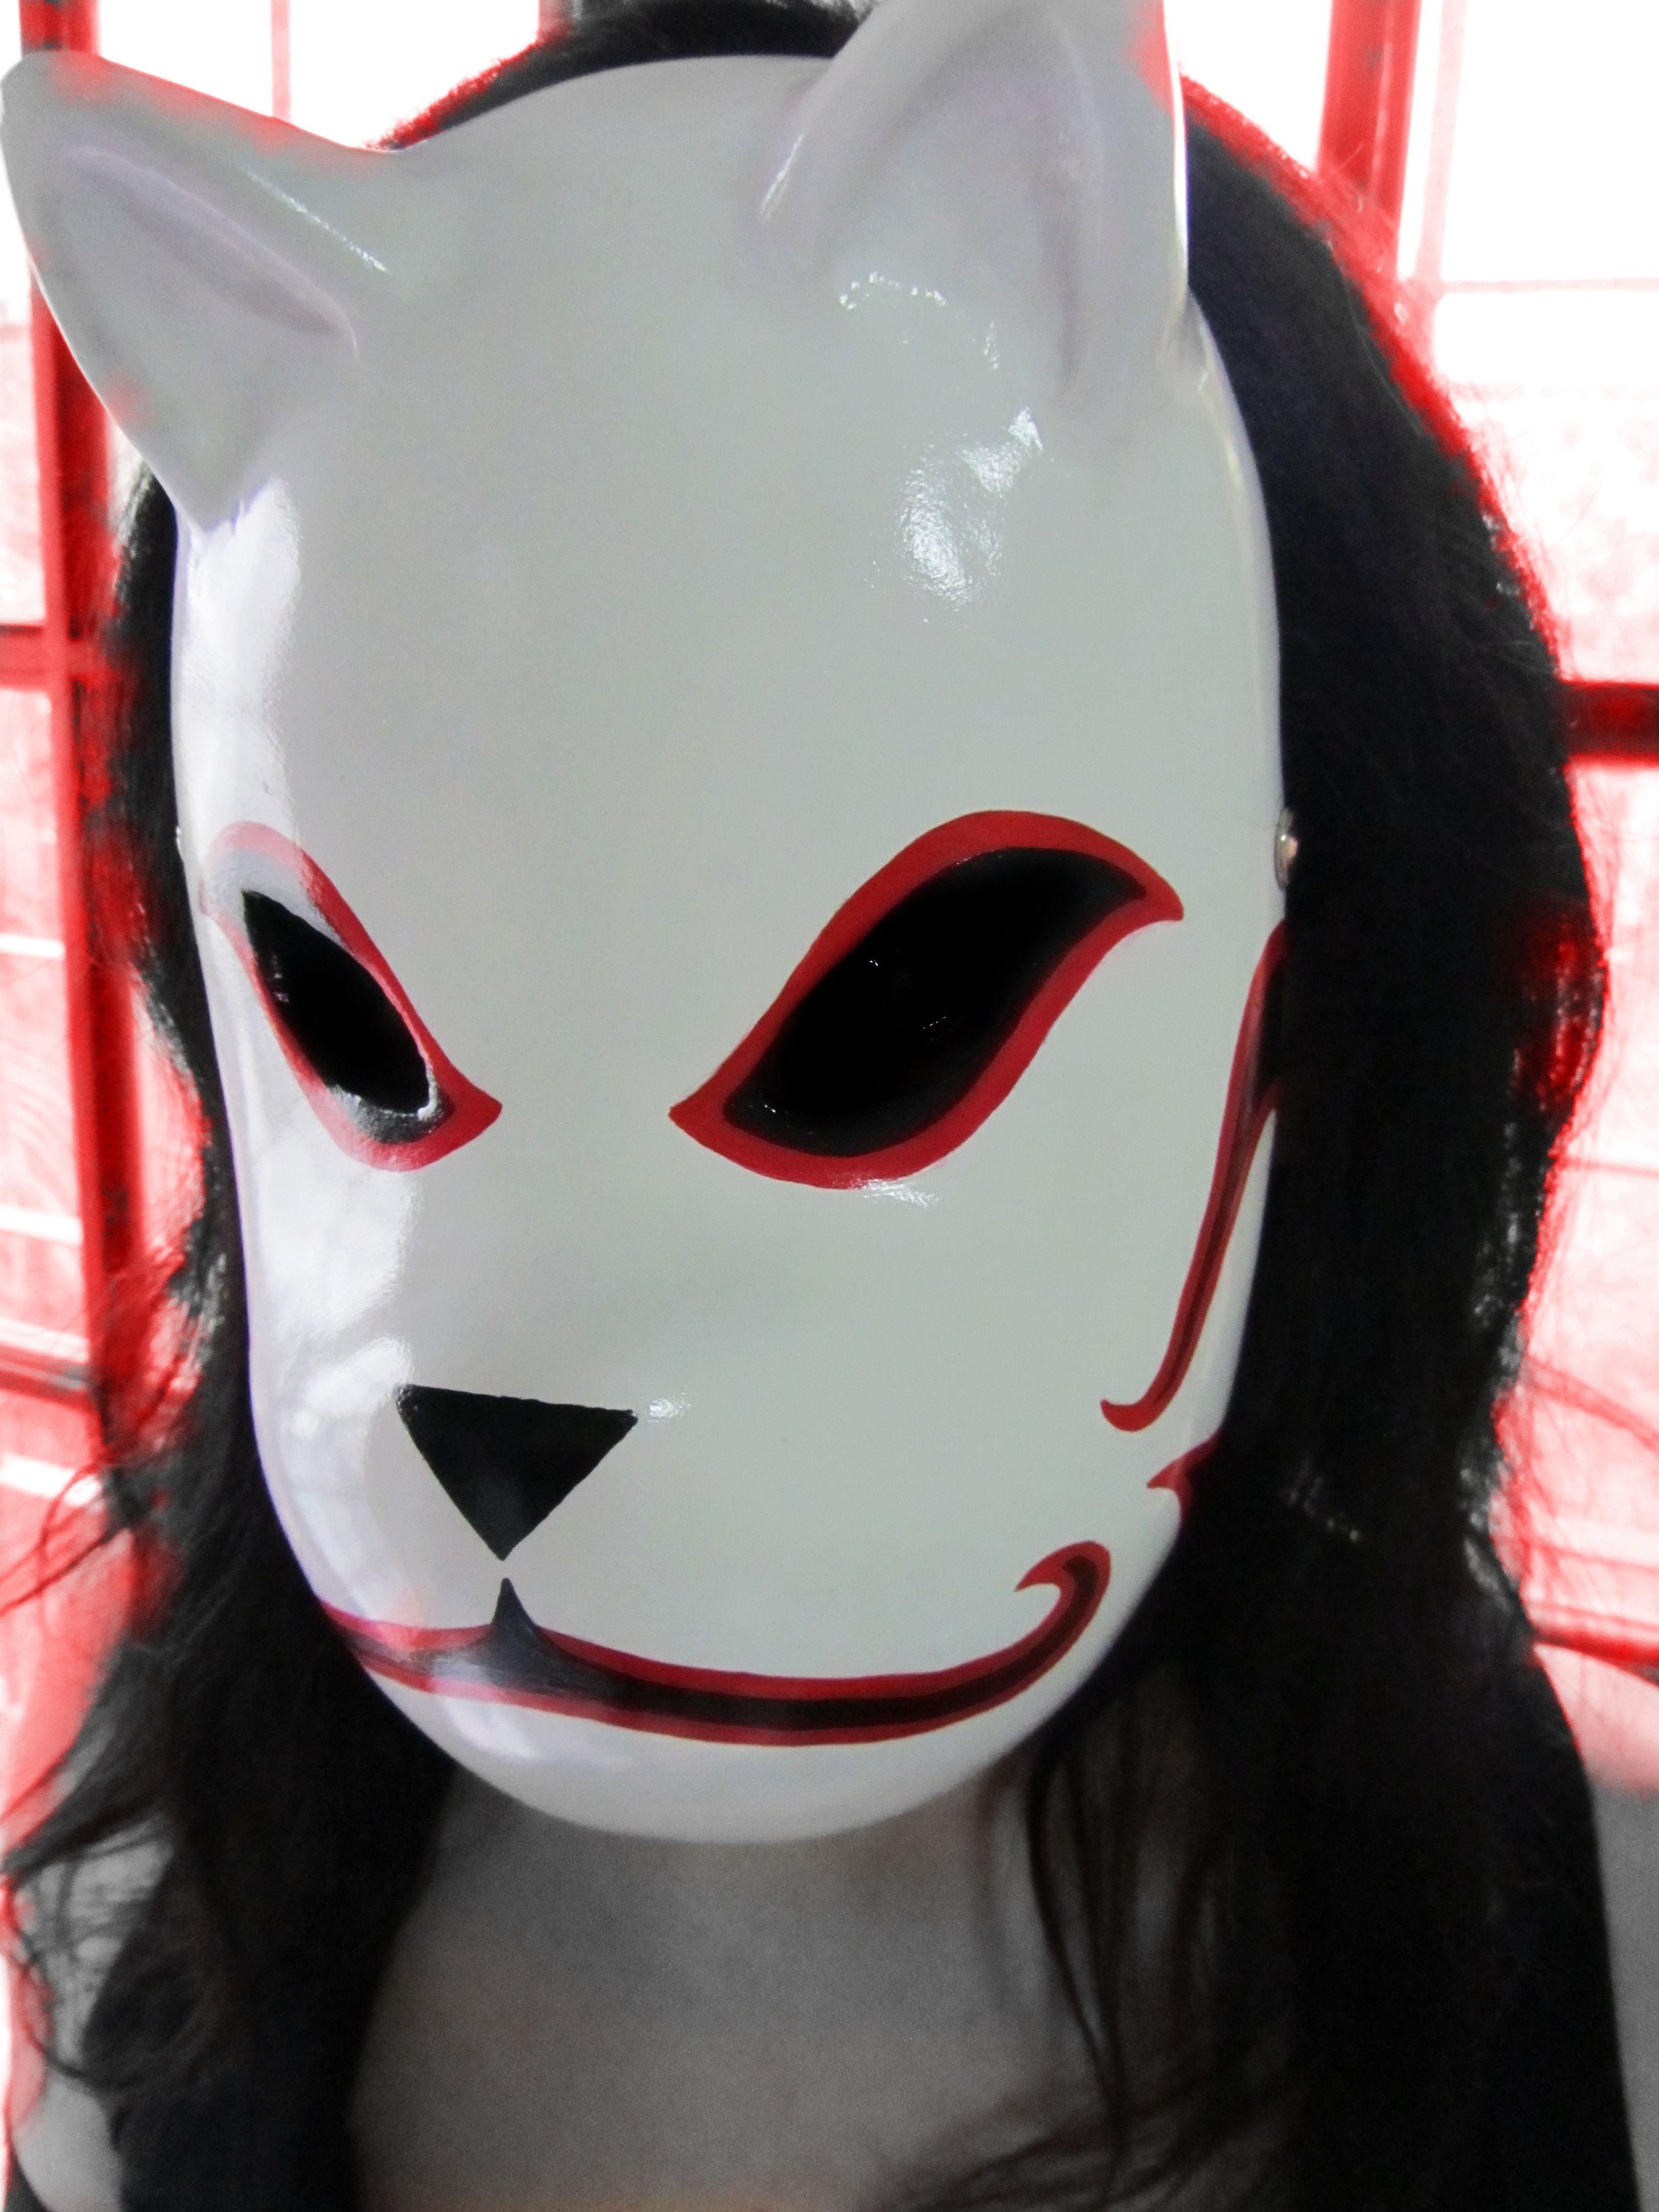 Anbu Mask - Naruto by Dominiquefx on DeviantArt